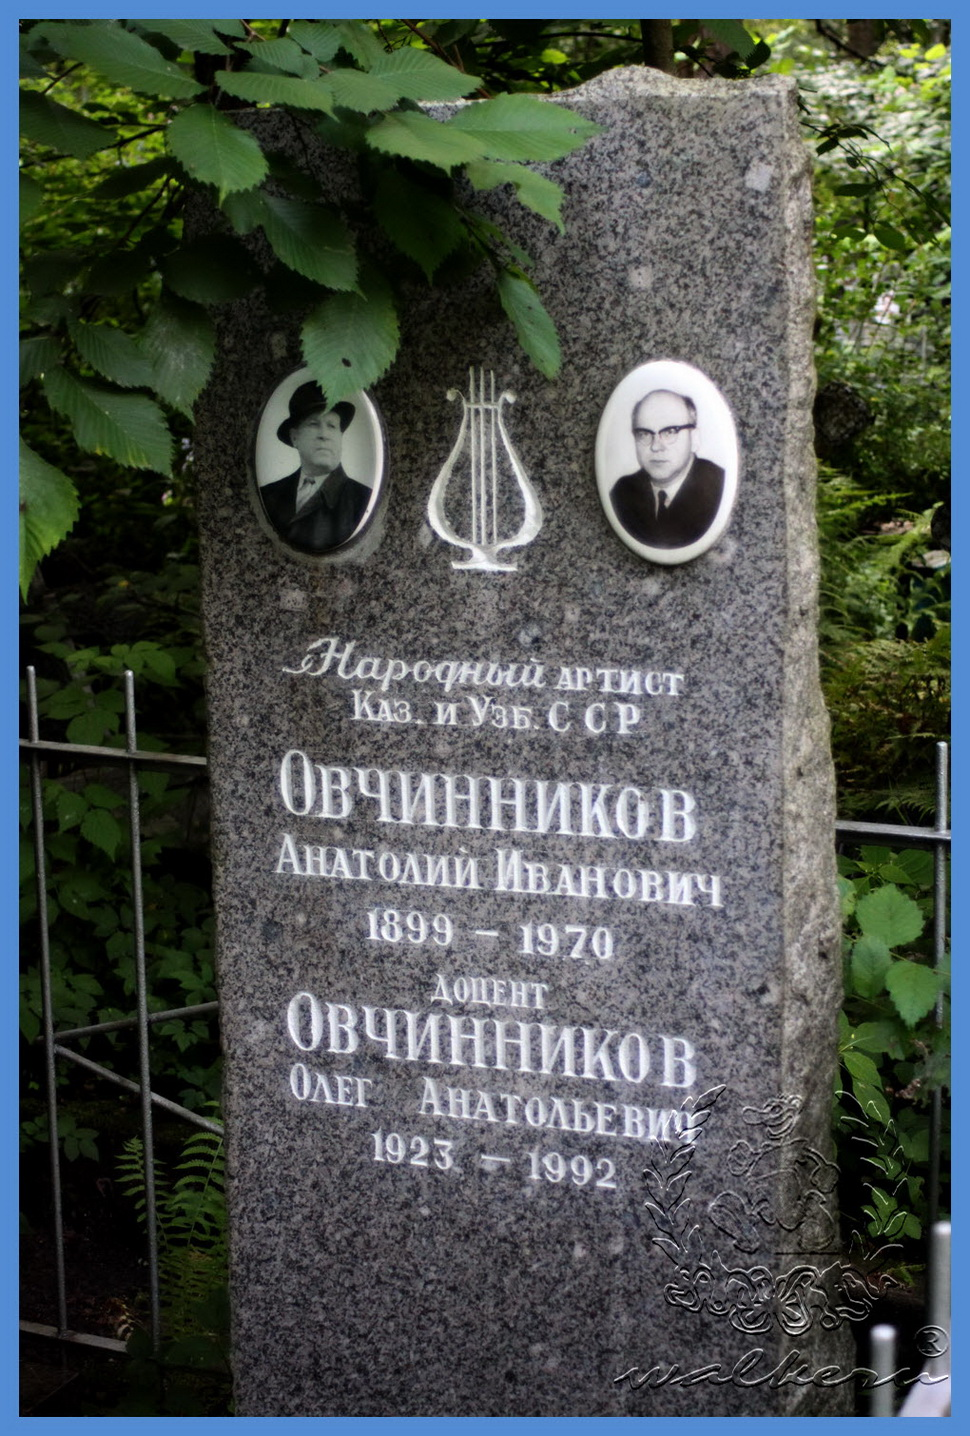 Овчинников Анатолий Иванович